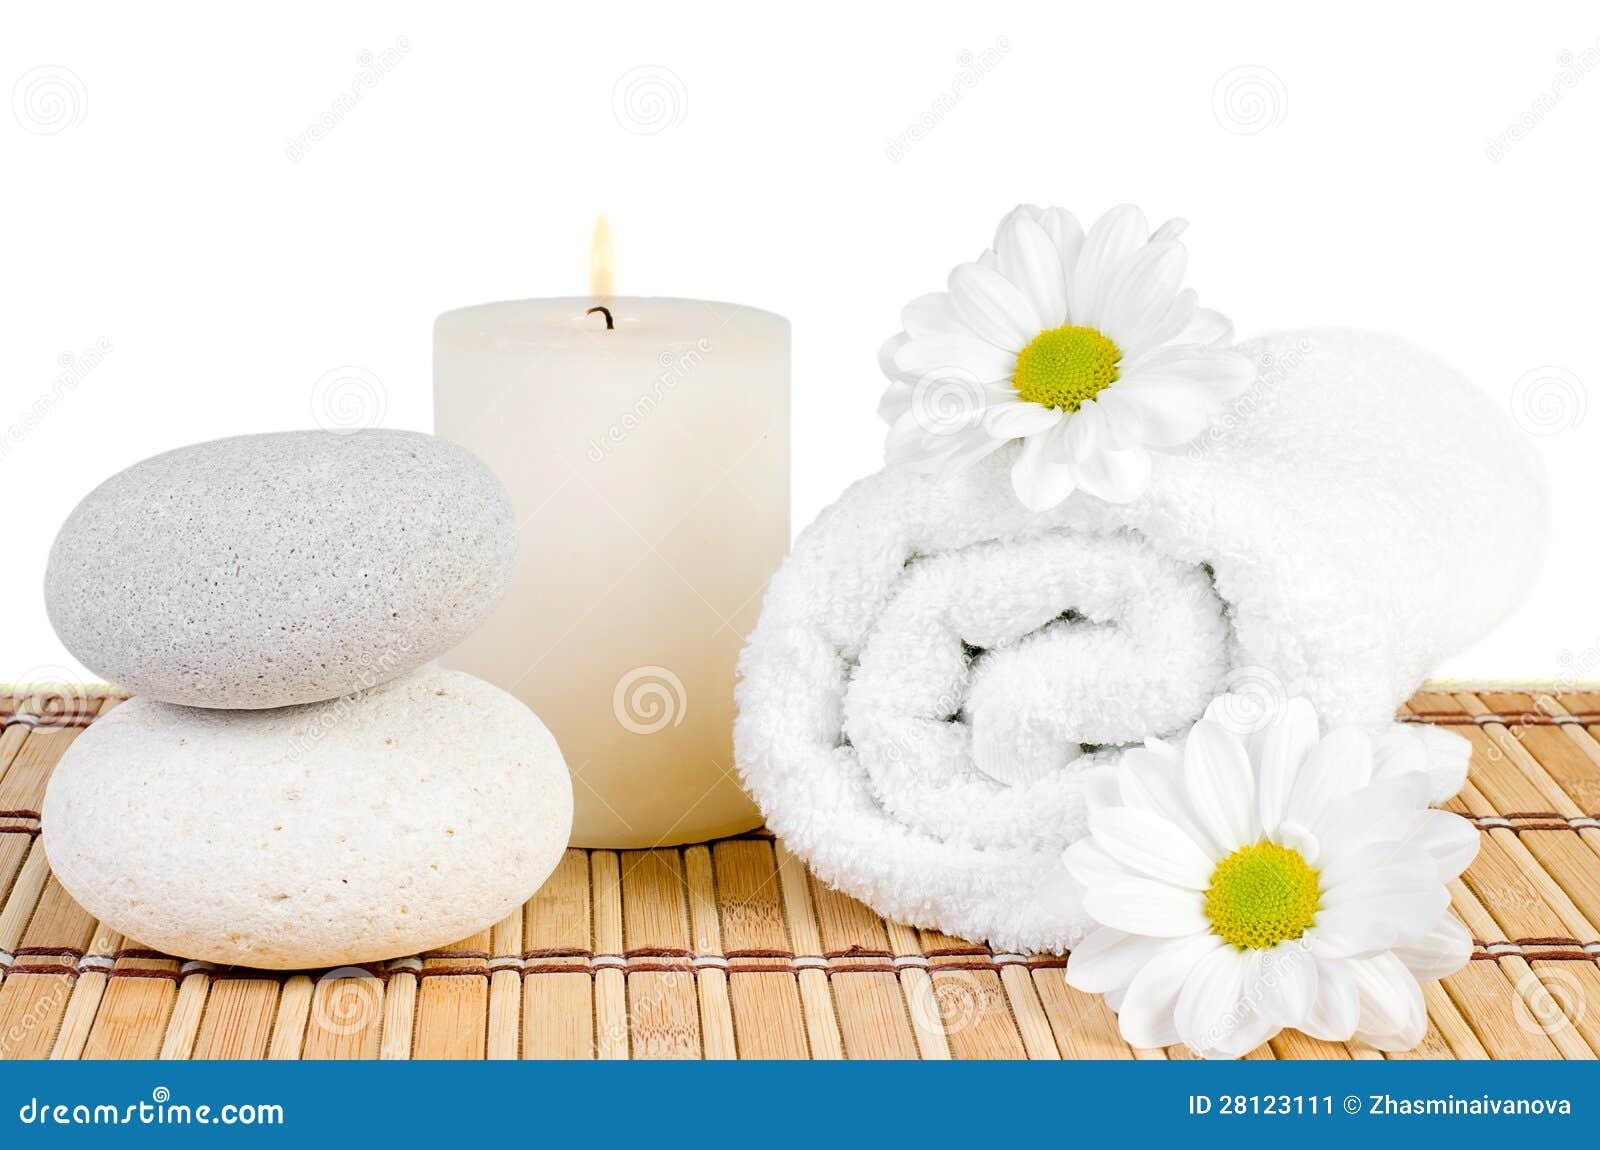 spa decoration stock image - image: 28123111